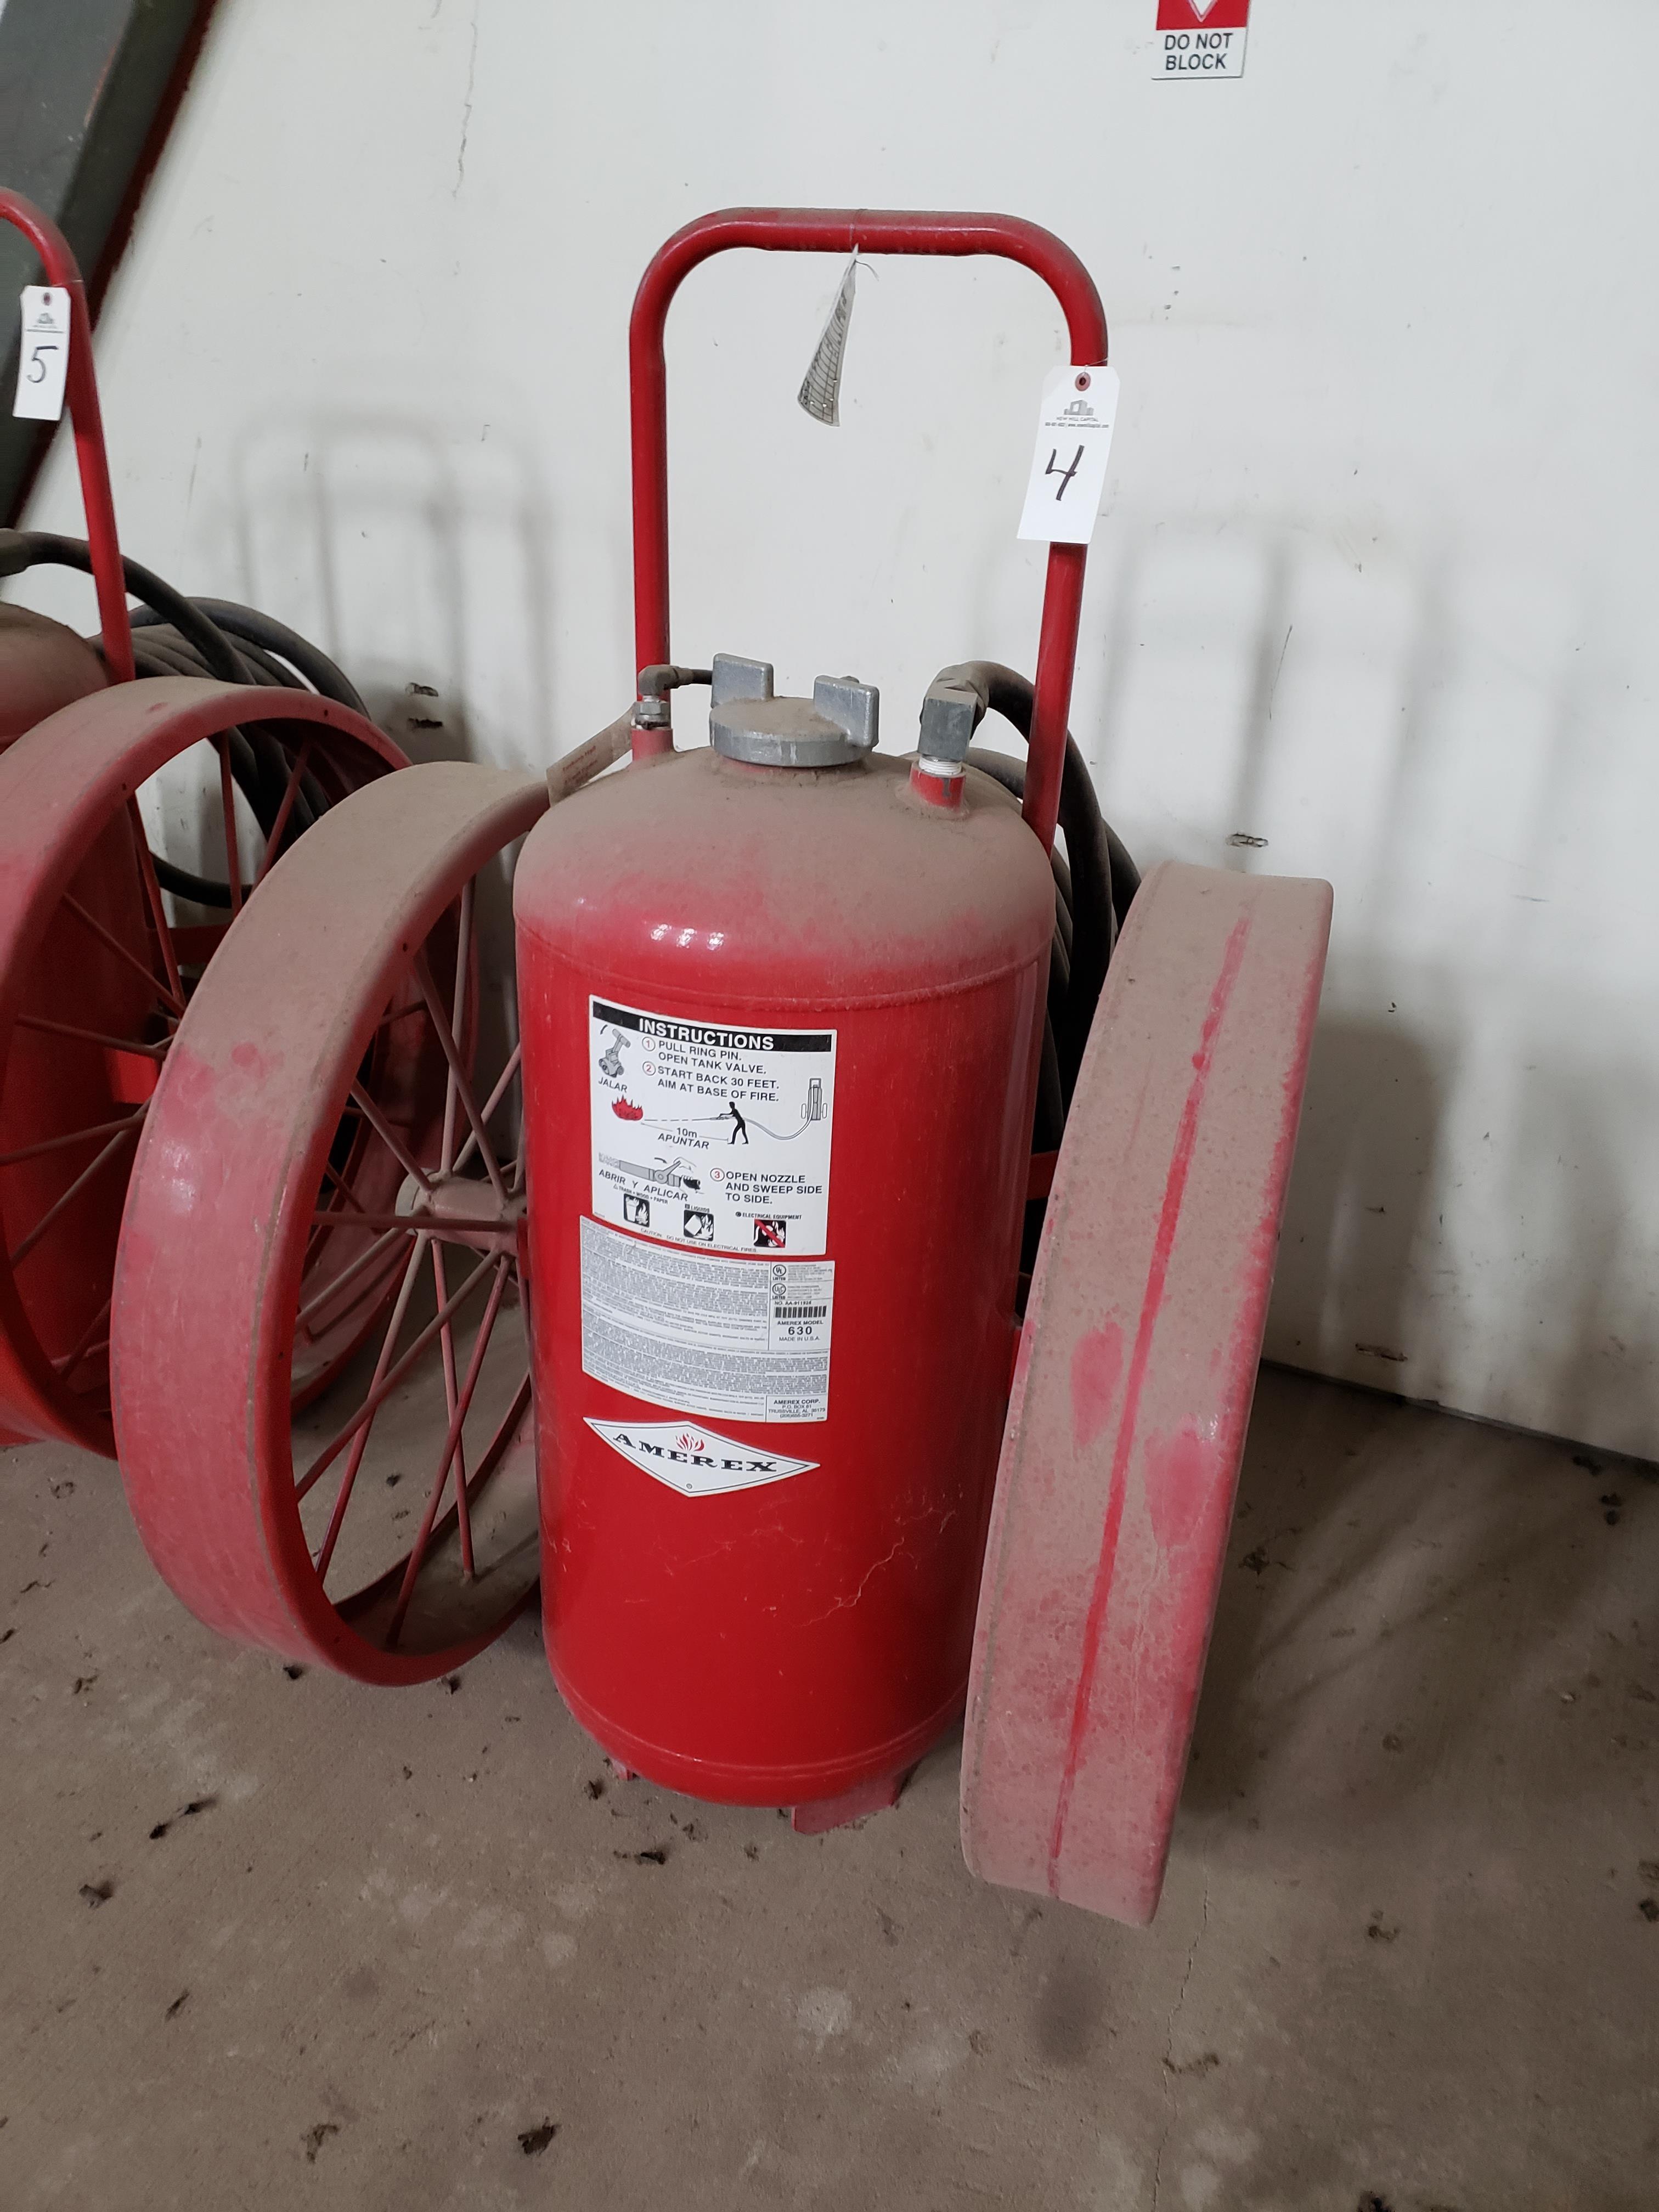 Lot 4 - Amerex Fire Extinguisher, M# 630 | Rig Fee: $25